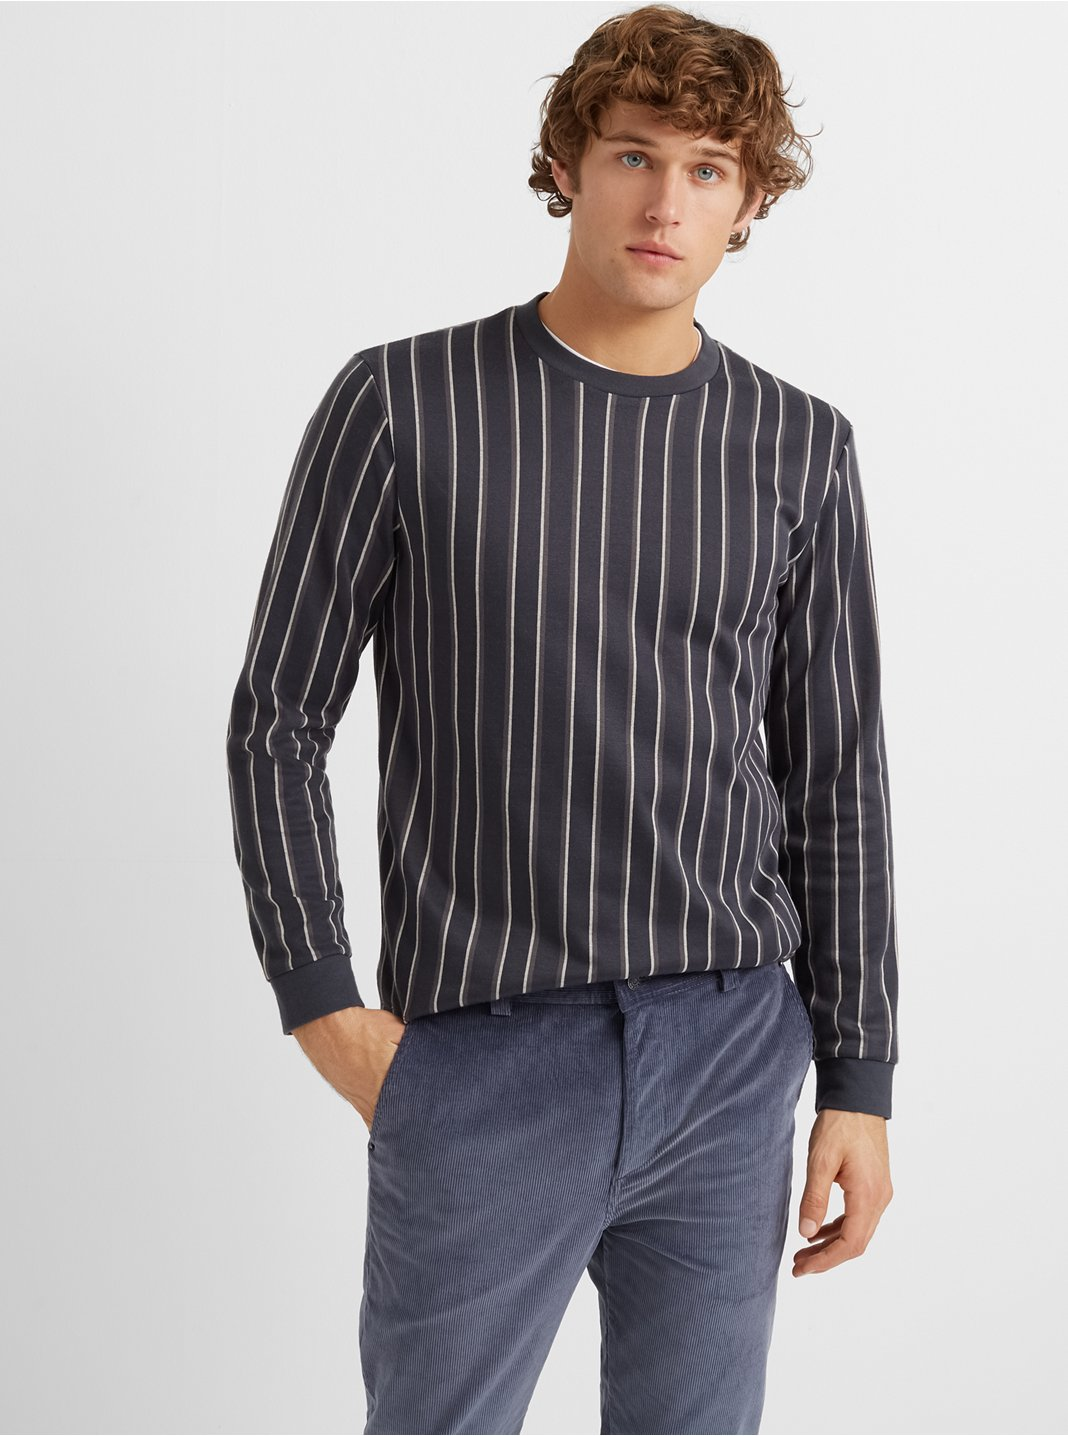 Striped Crewneck Top